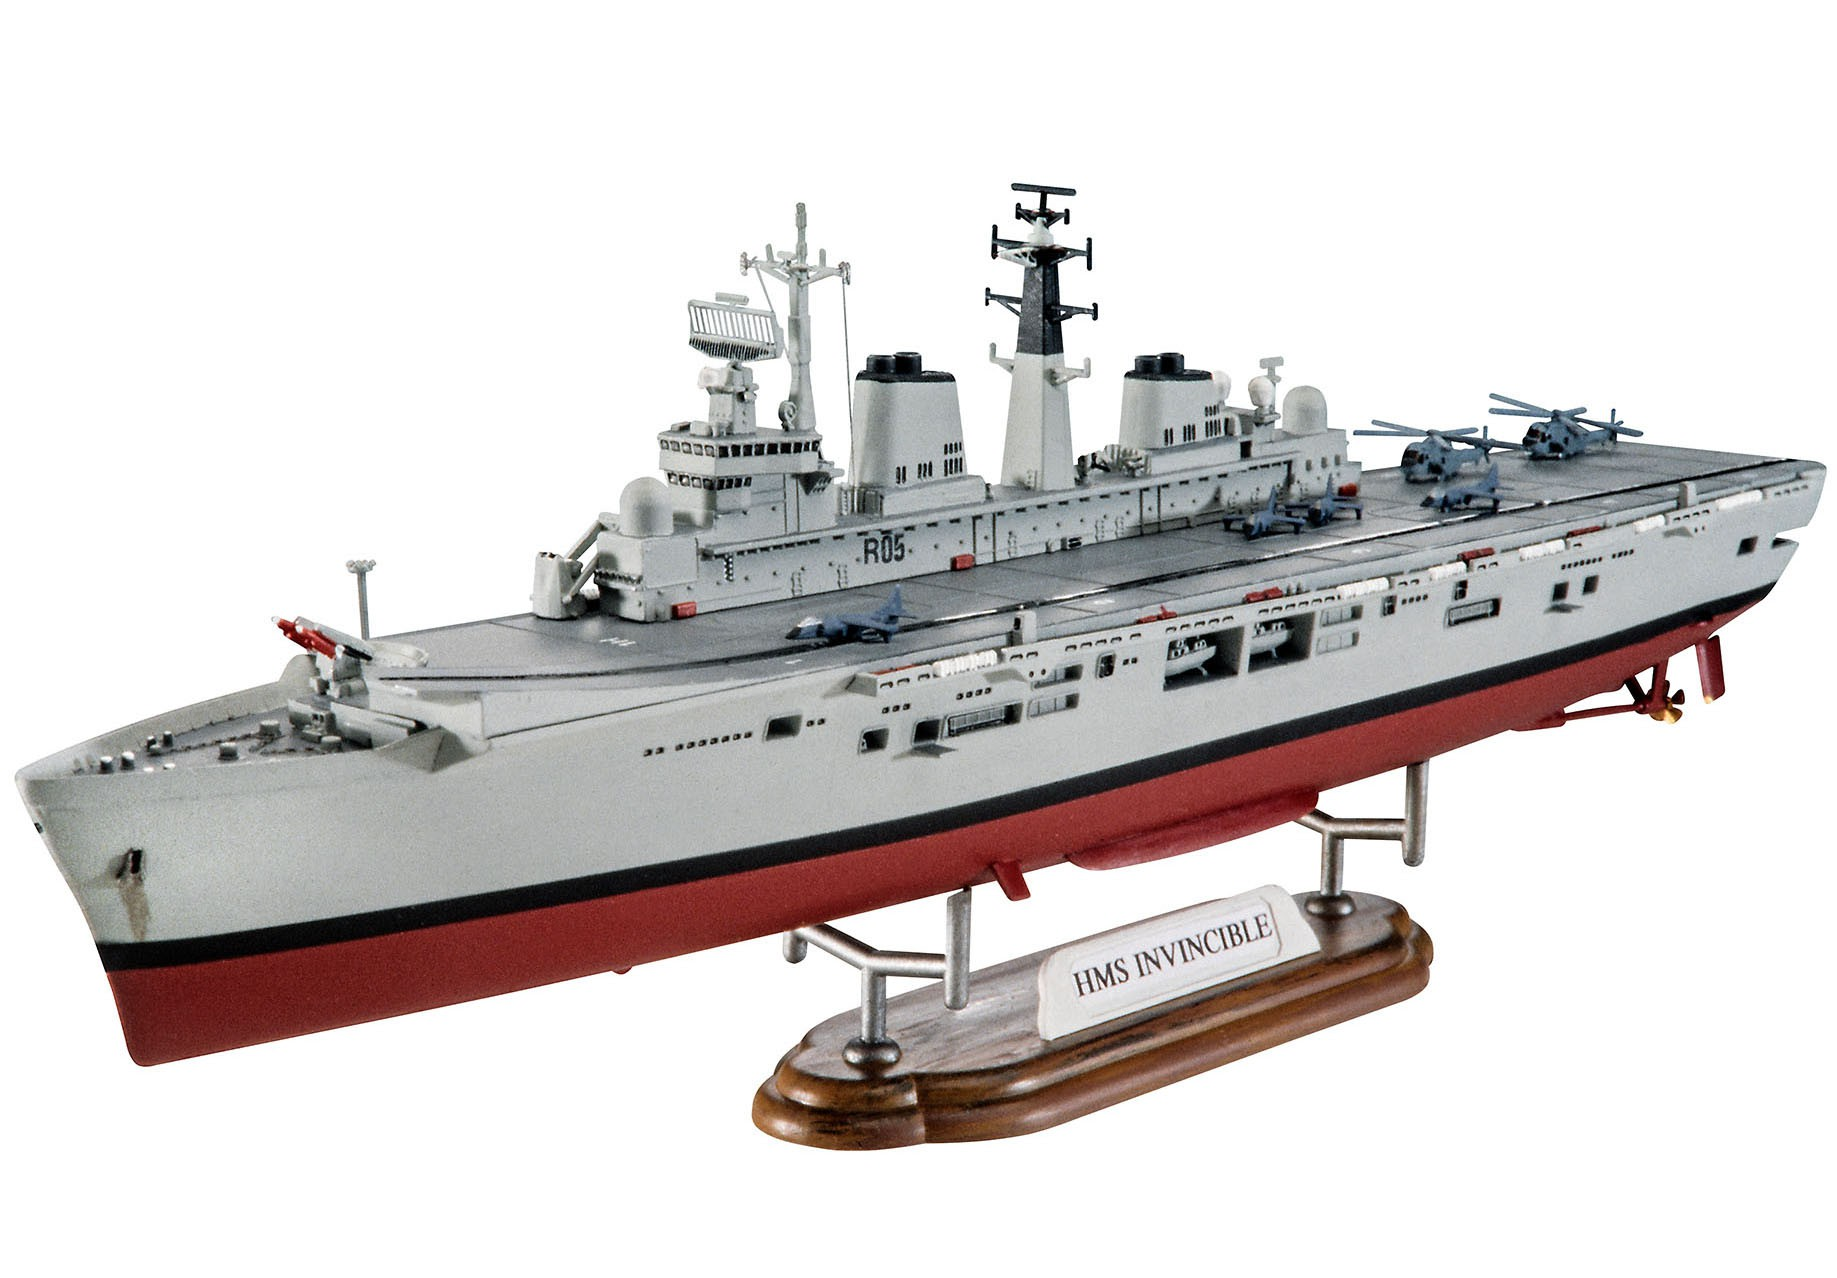 Model Set HMS Invincible (Falkland War) - 1/700 - Revell 65172  - BLIMPS COMÉRCIO ELETRÔNICO